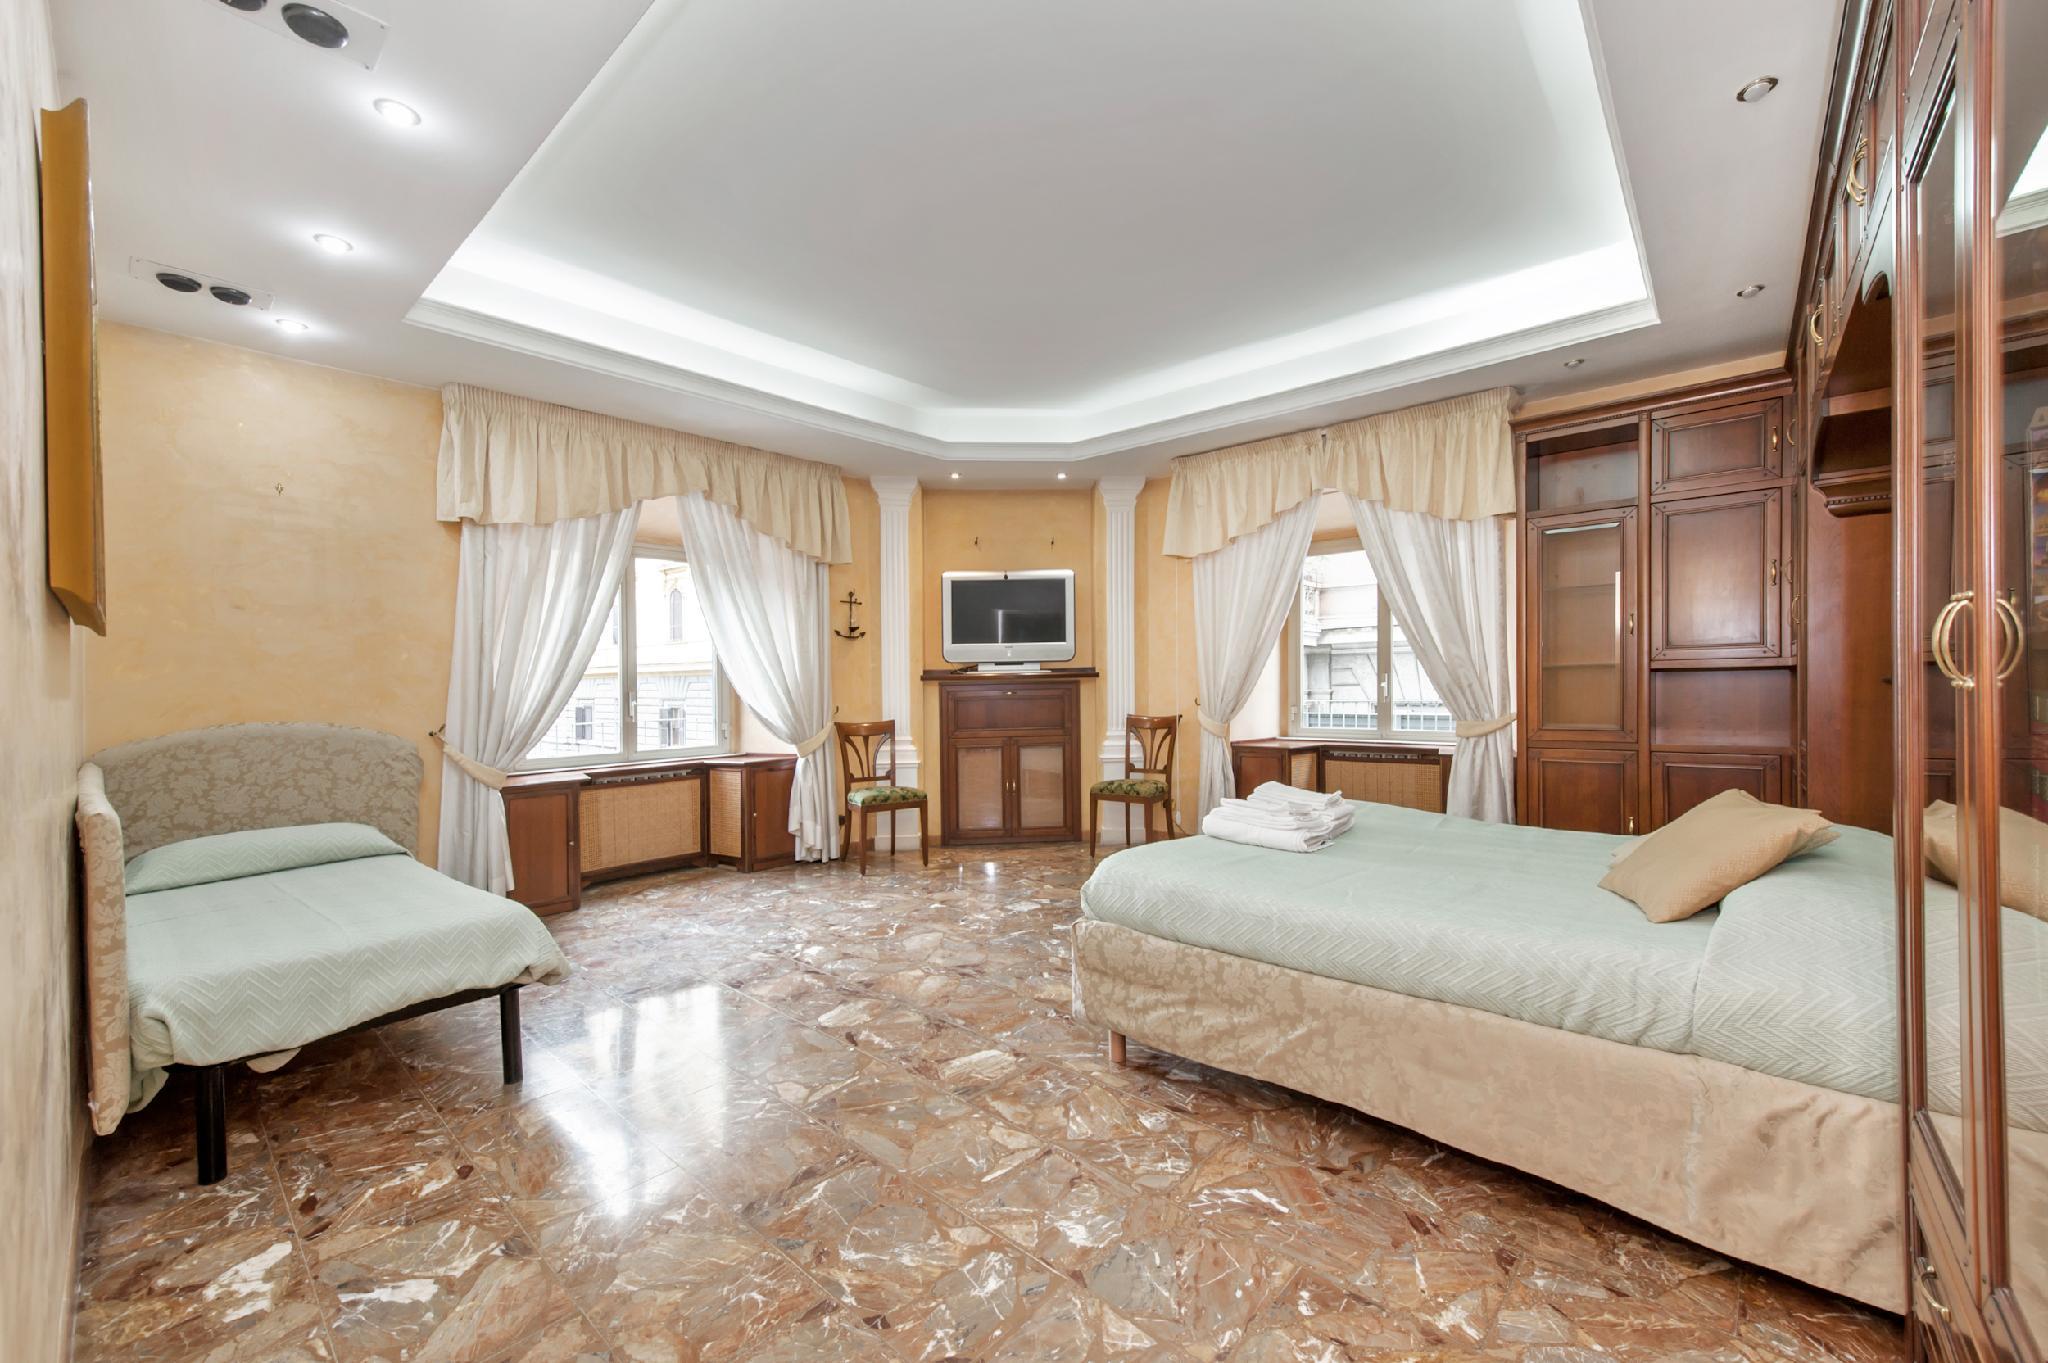 Spacious Home In Rome Colosseum And Termini N 15mins